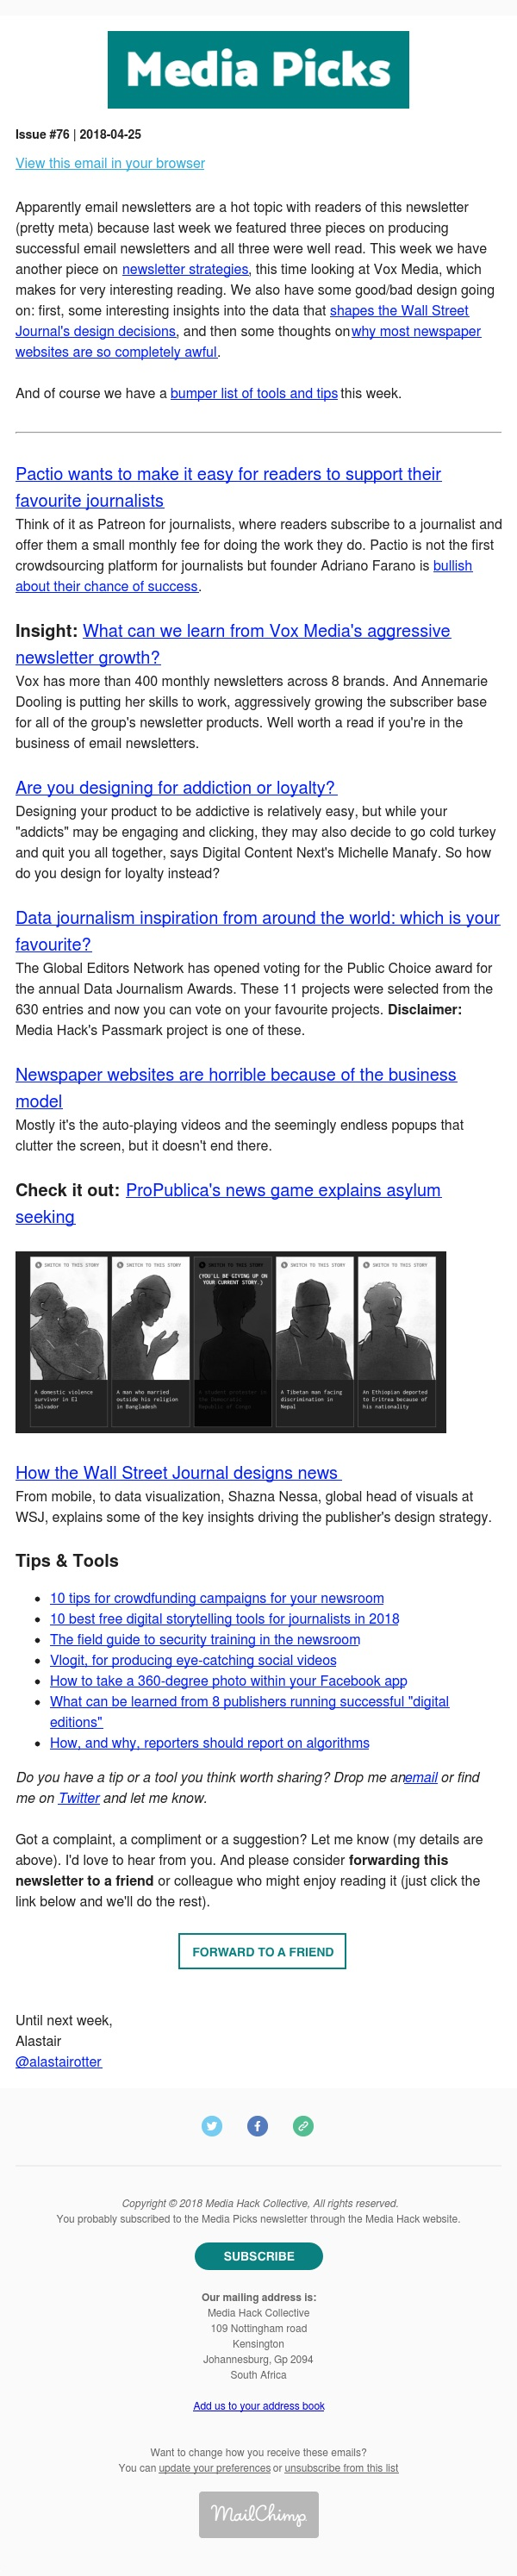 Media Picks #76 Newsletter strategies, good vs bad design & lots of tools and tips